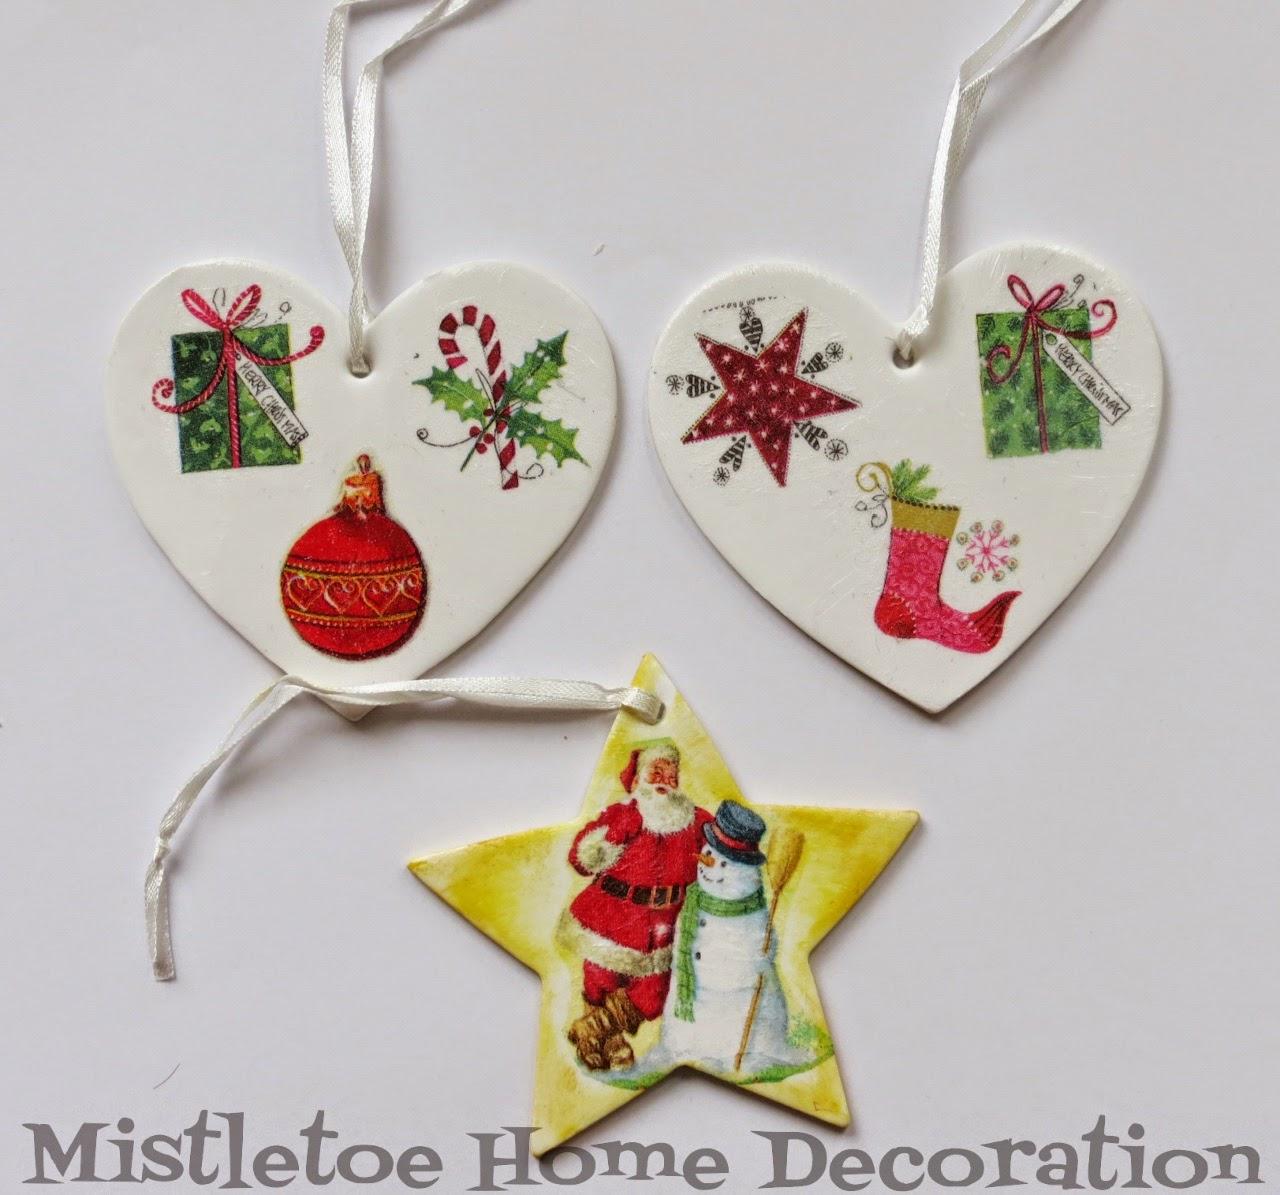 Mistletoe Home Designs: Christmas decoupage with napkins - coasters ...